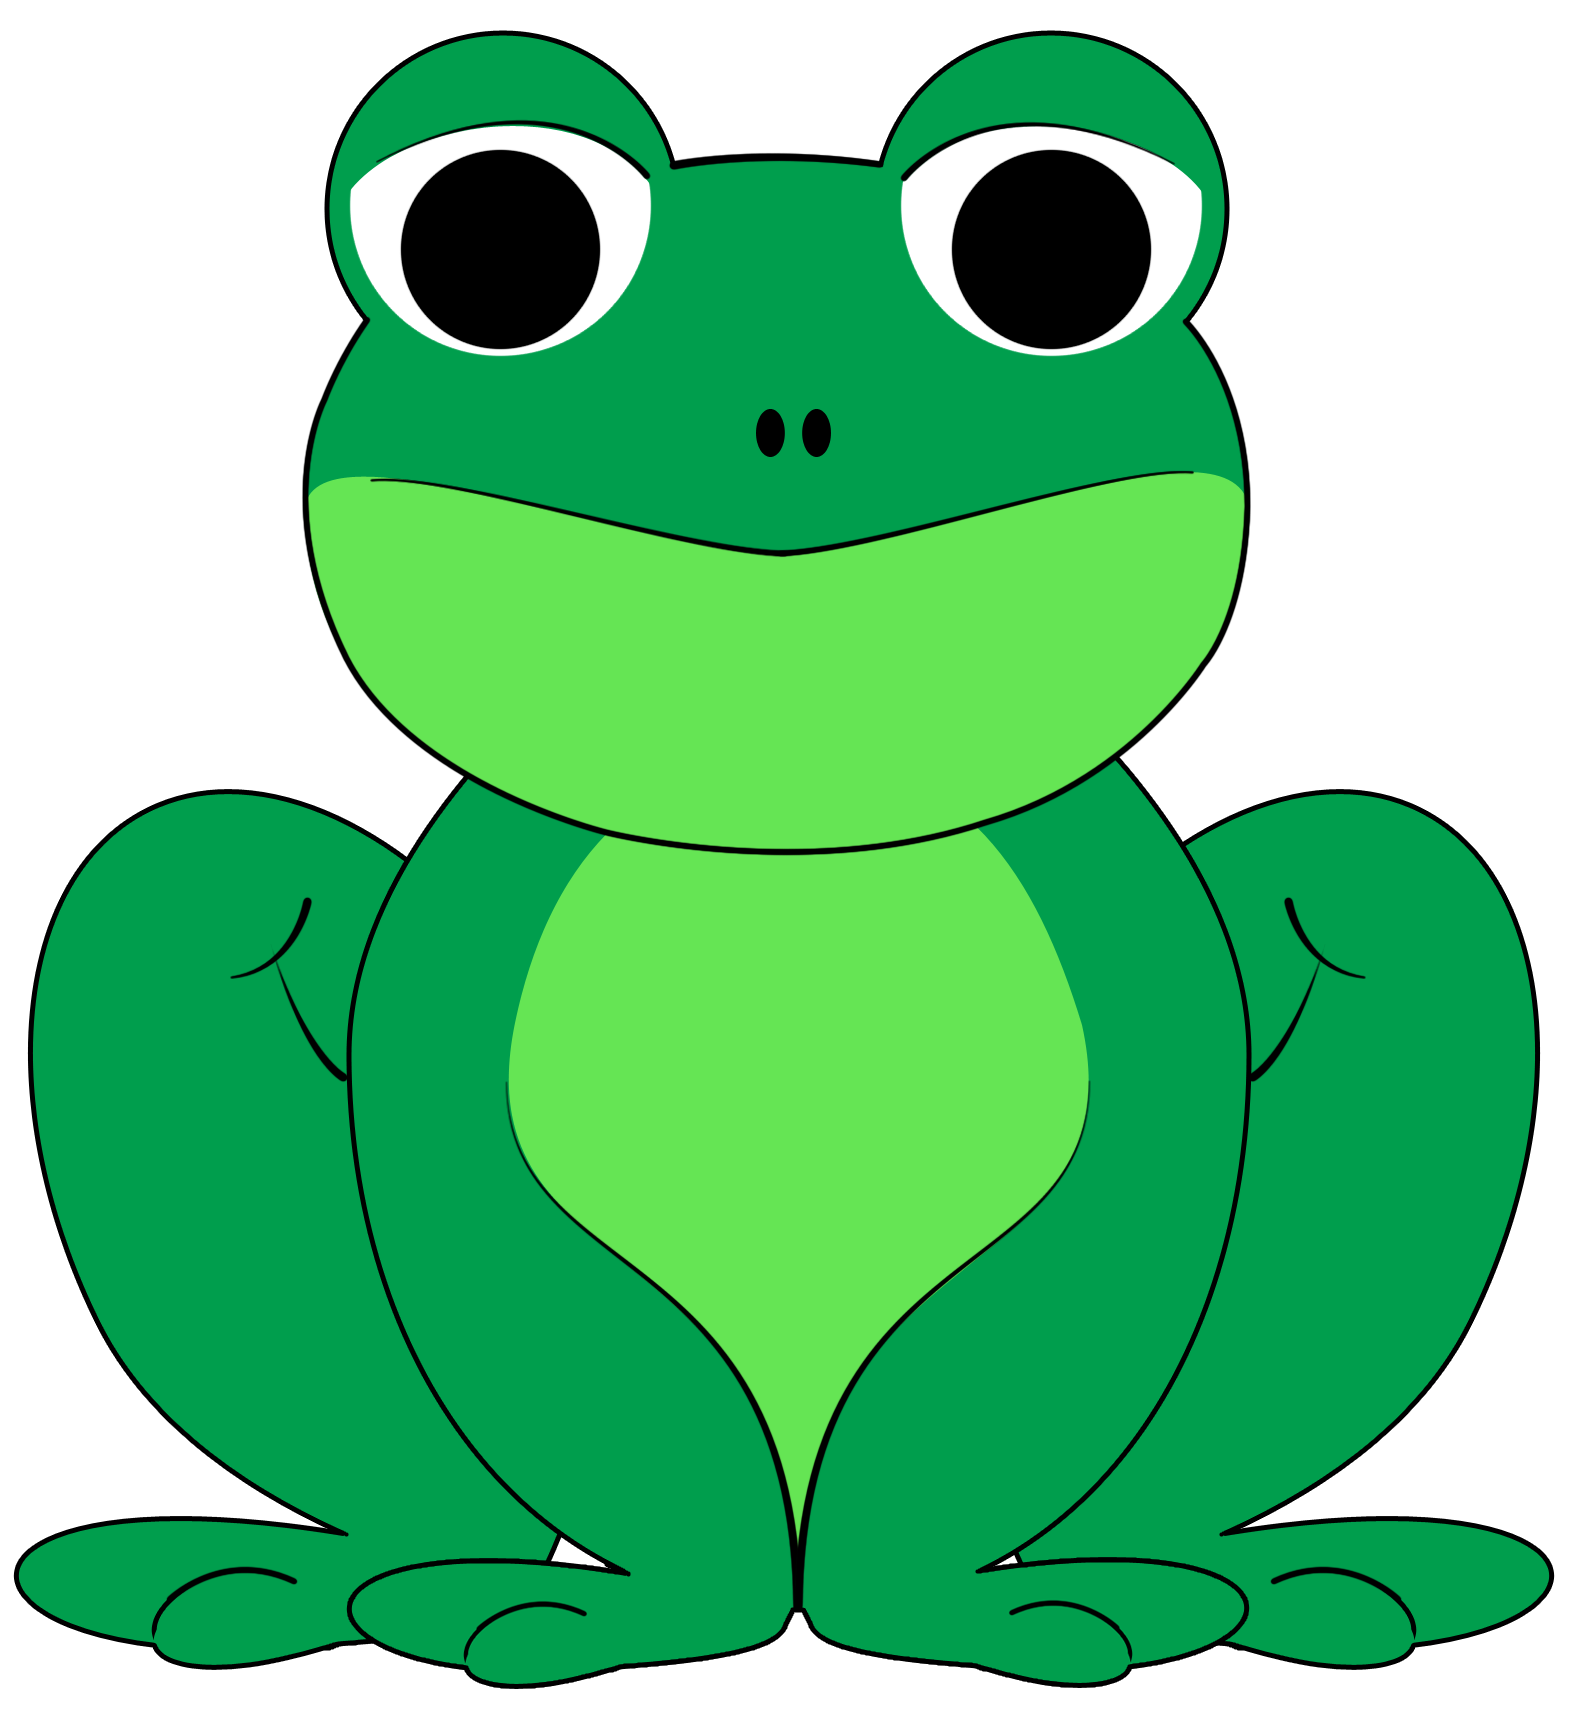 1575x1725 Frog Clip Art Free Vector Image 5